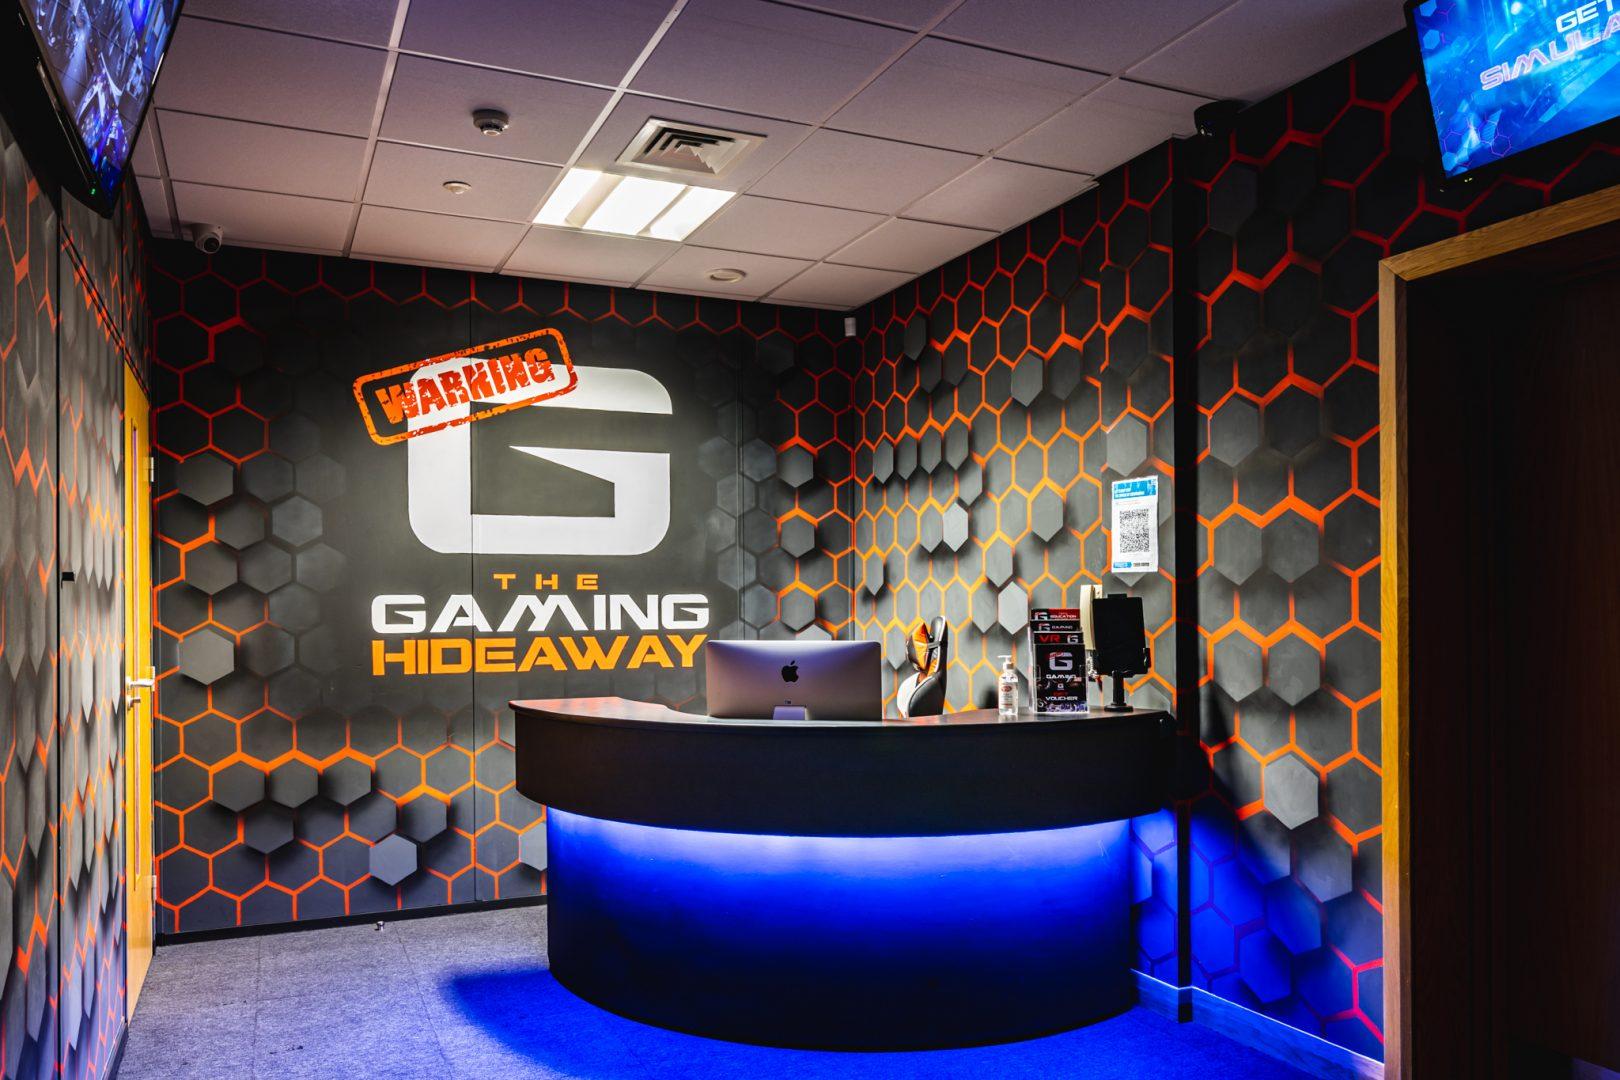 The Gaming Hideaway